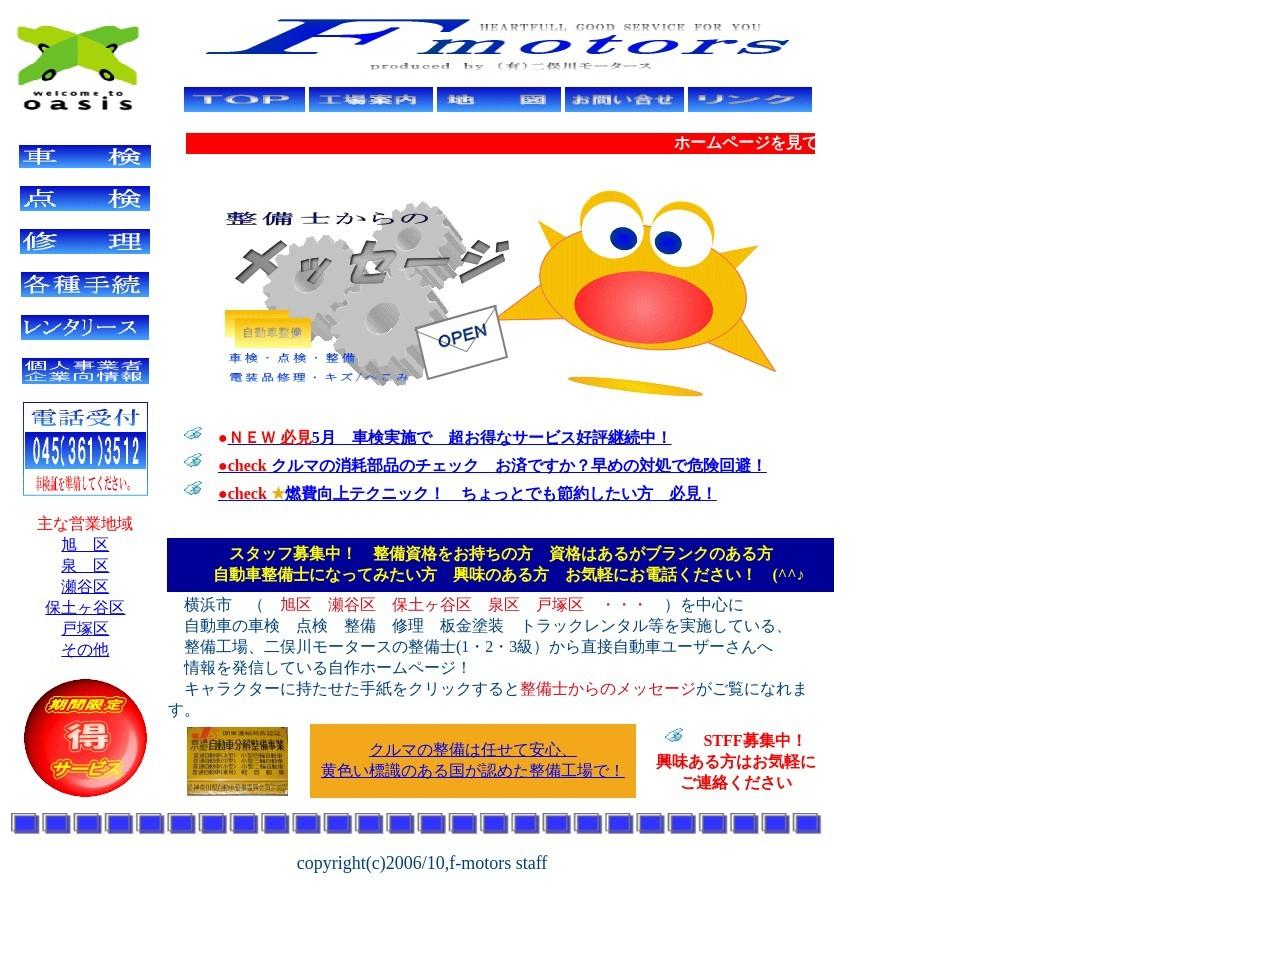 株式会社二俣川モータース/第一工場